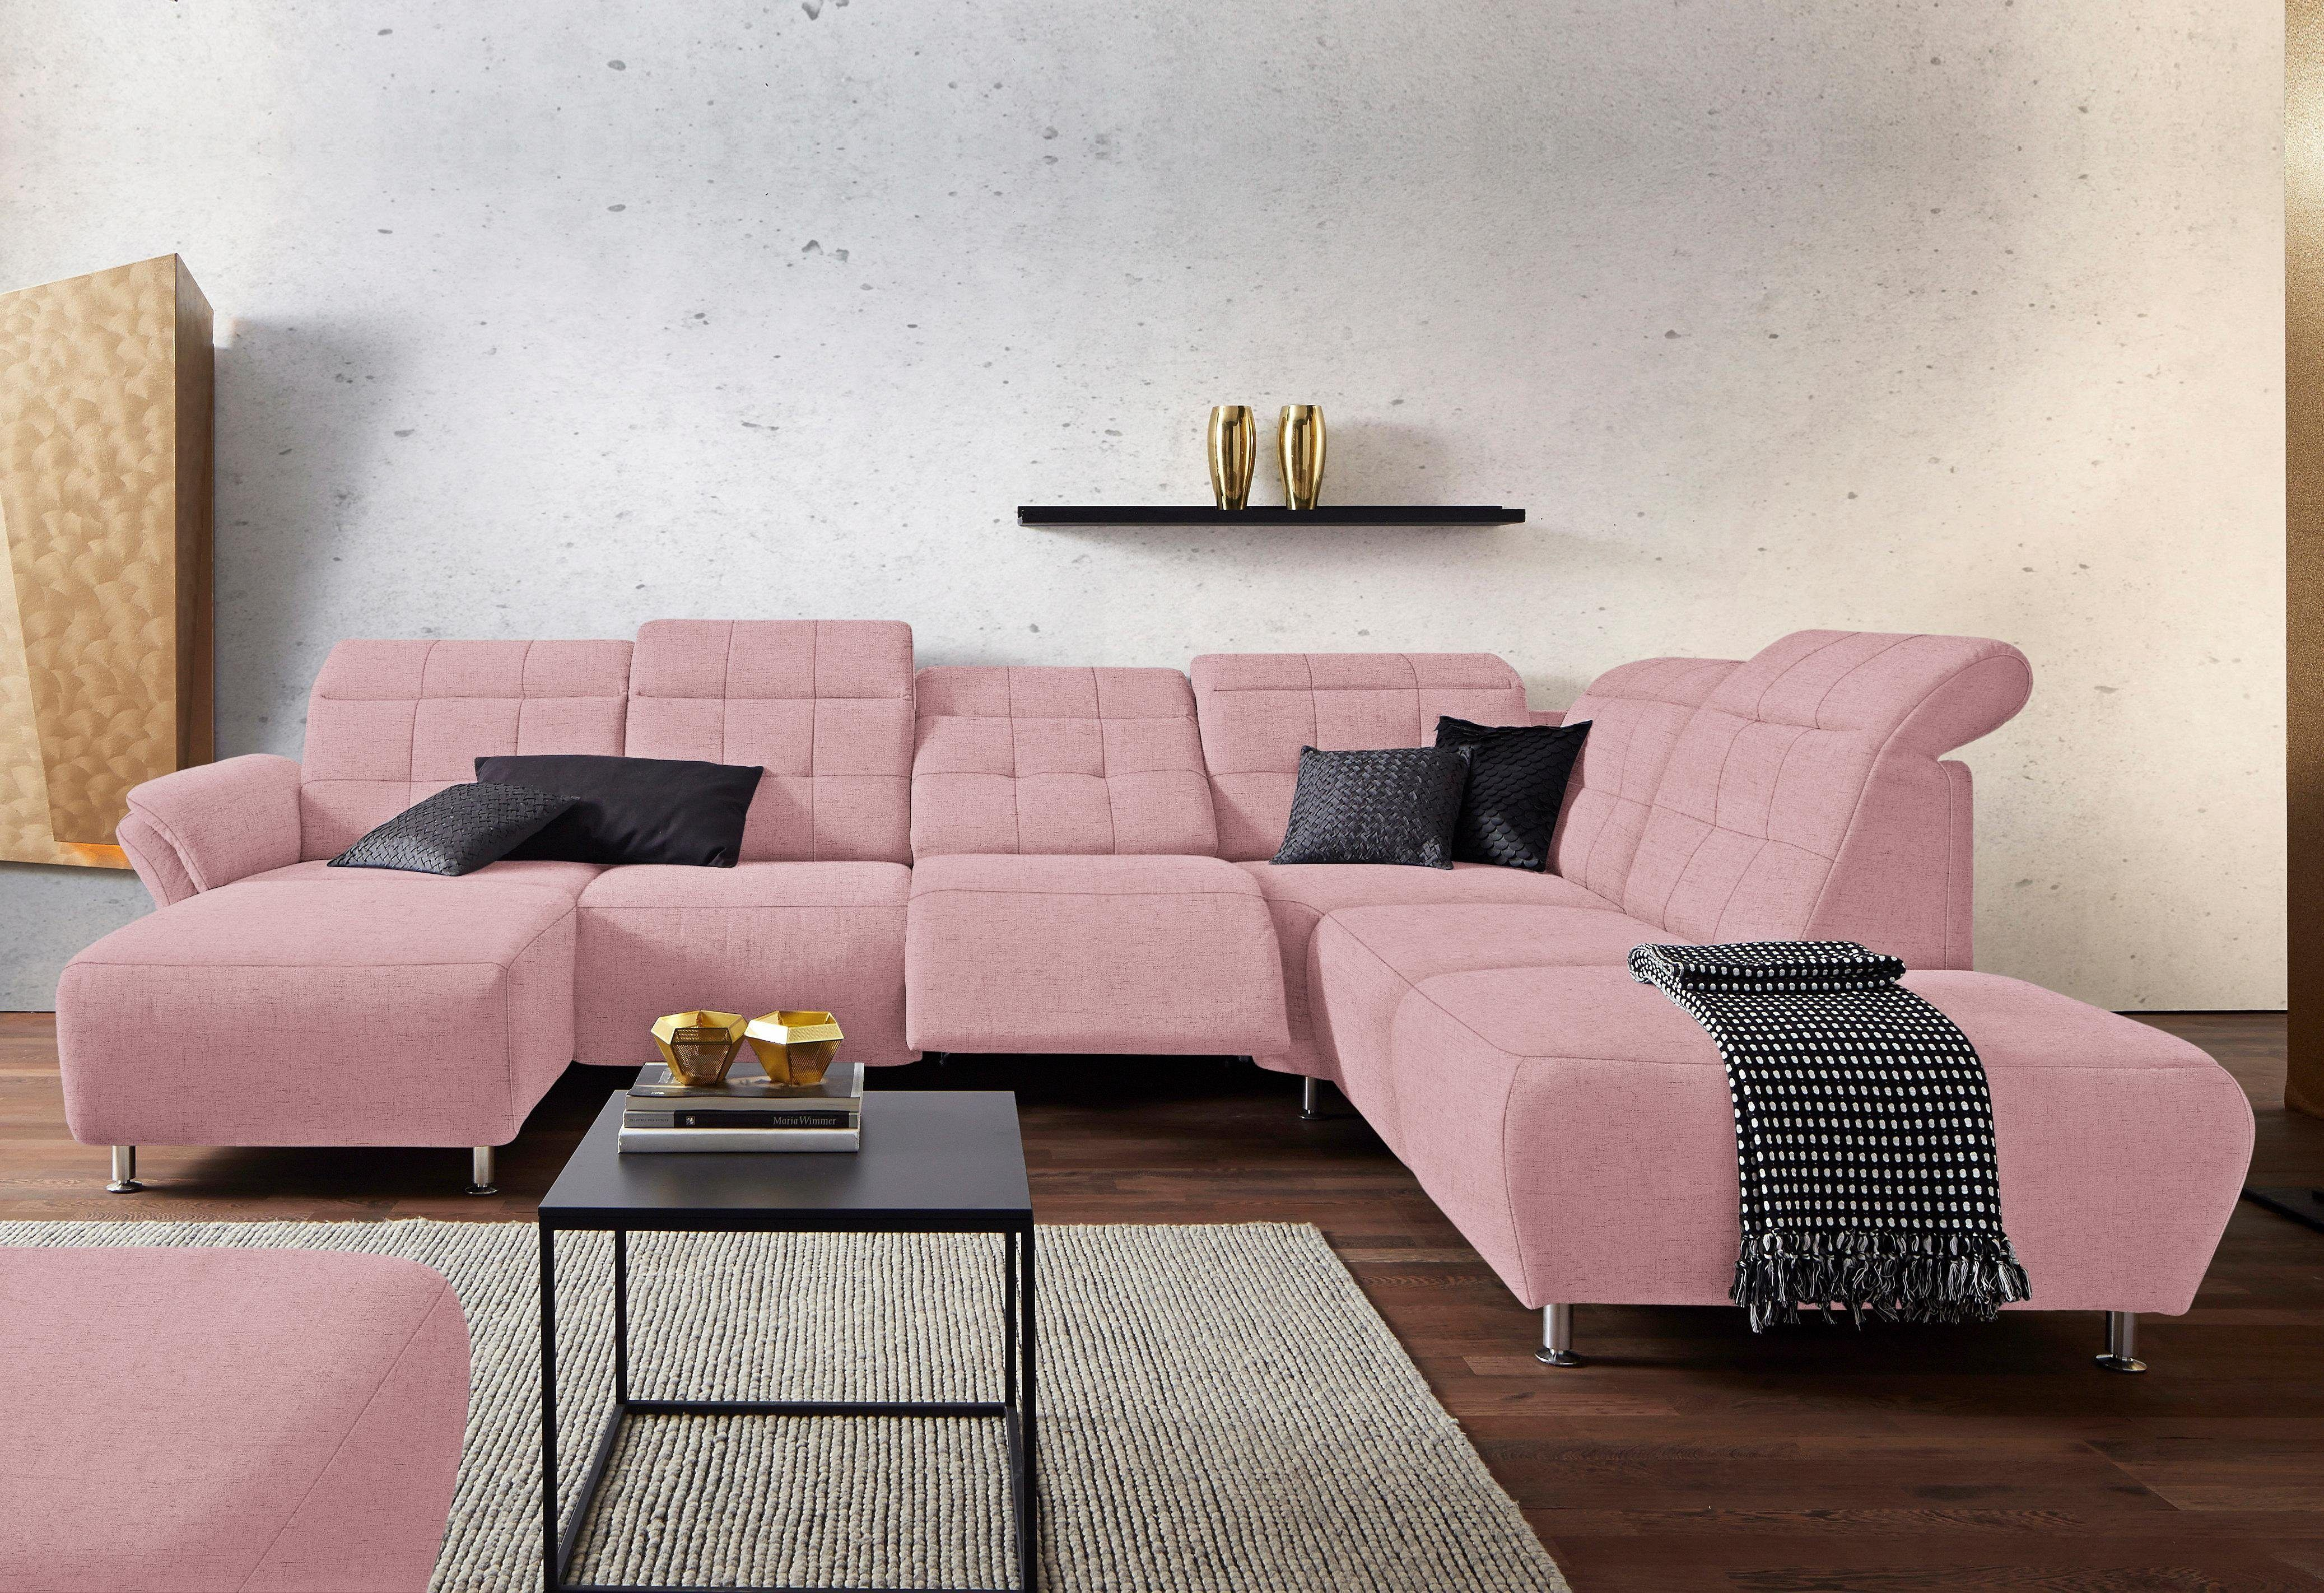 Astounding Wohnlandschaft Rosa Referenz Von Rosa, Ottomane Rechts, Fsc®-zertifiziert, Places Of Style